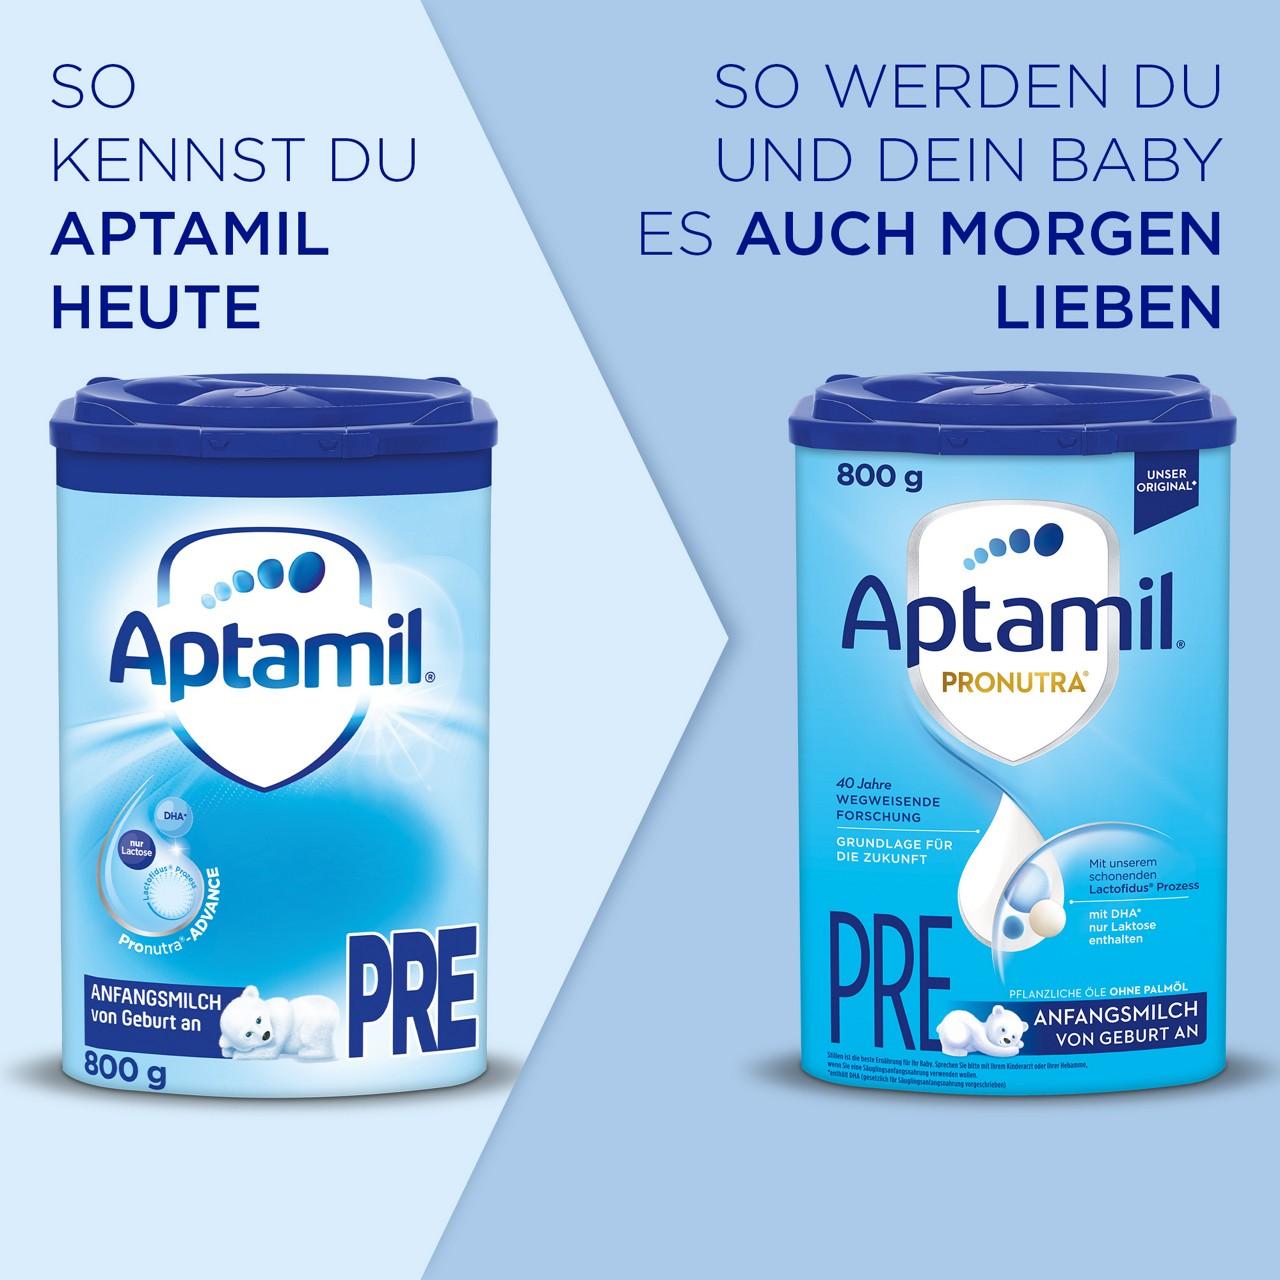 Das neue Aptamil Pronutra mit neuer Rezeptur